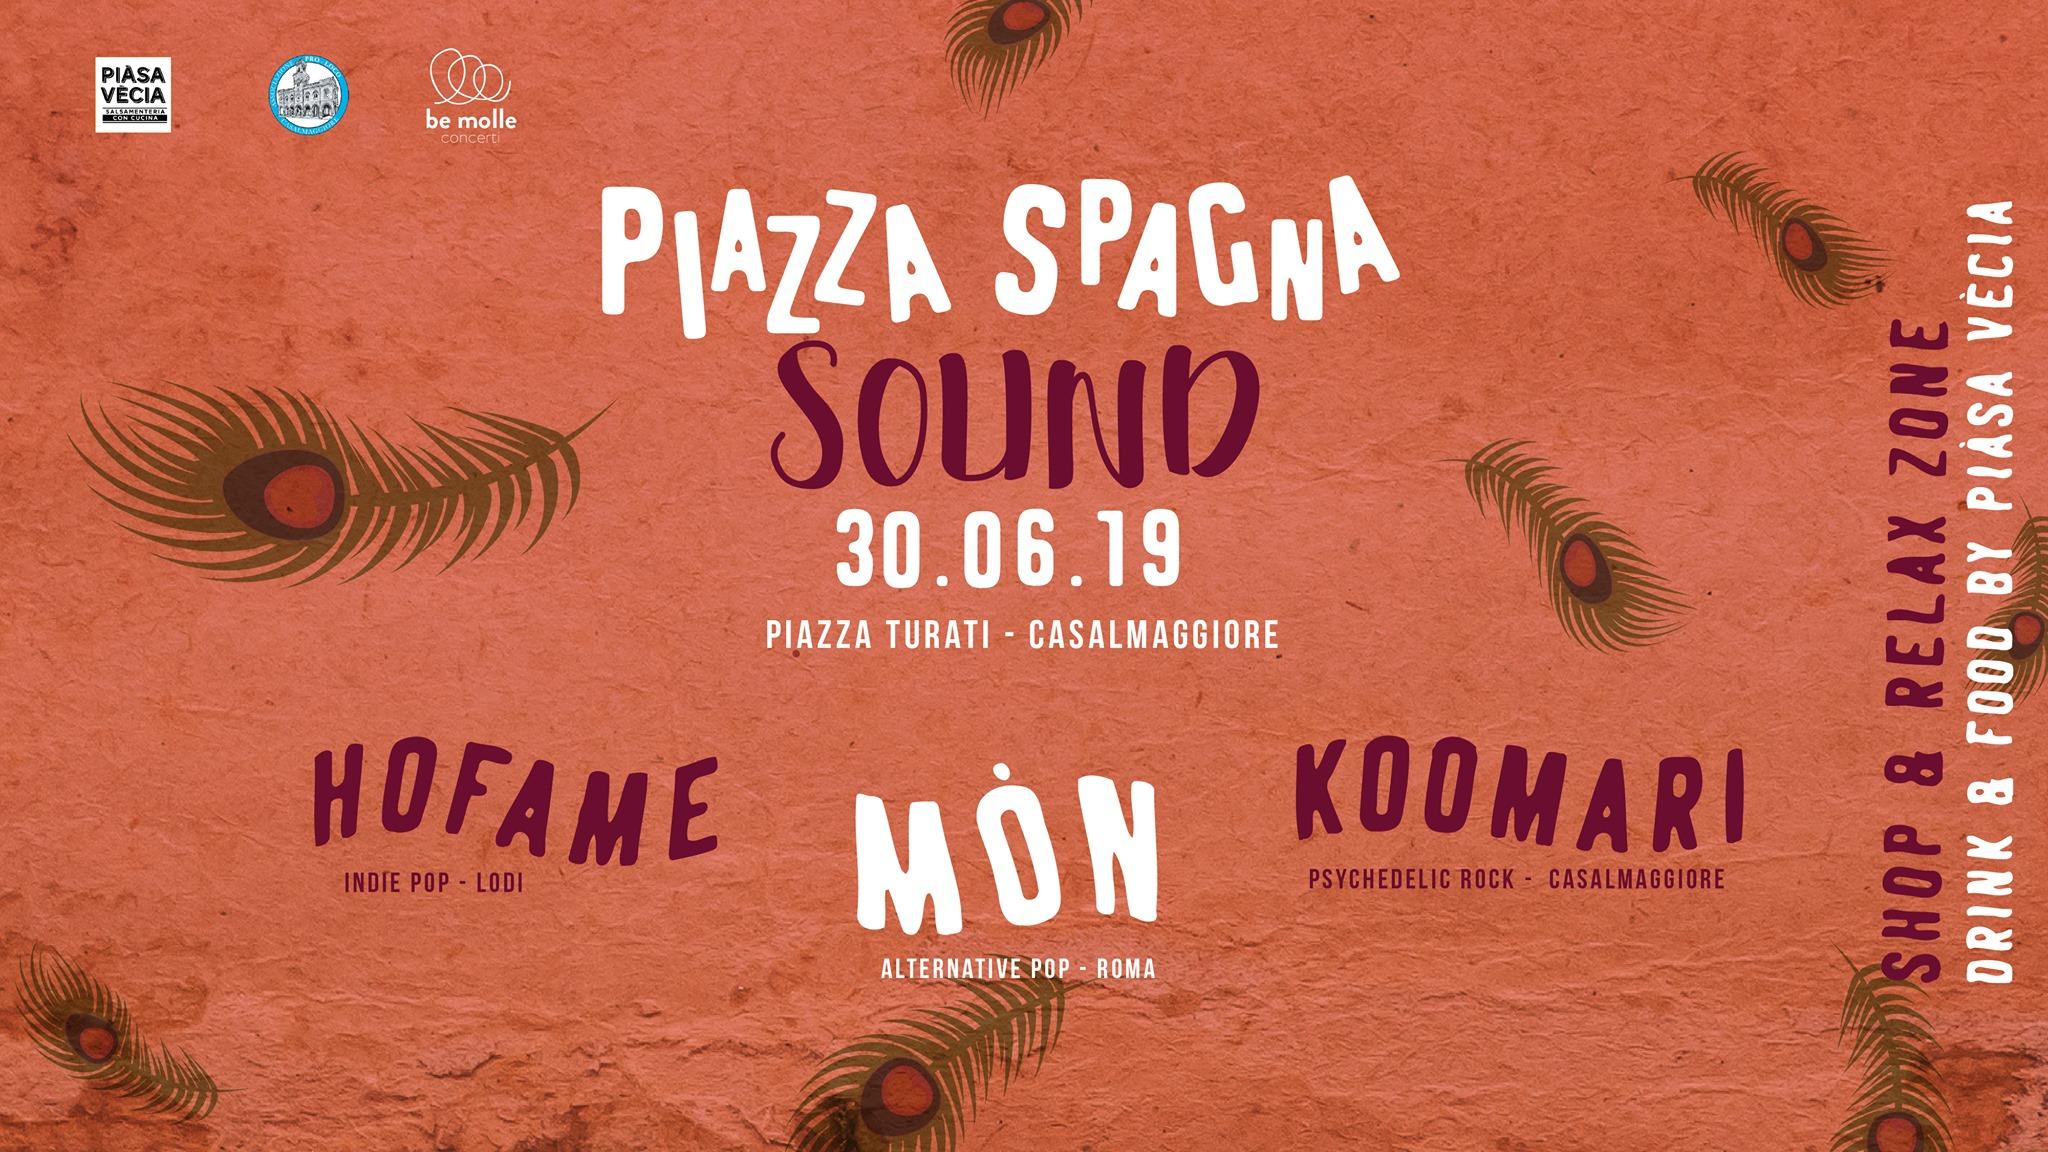 Piazza Spagna Sound 2019